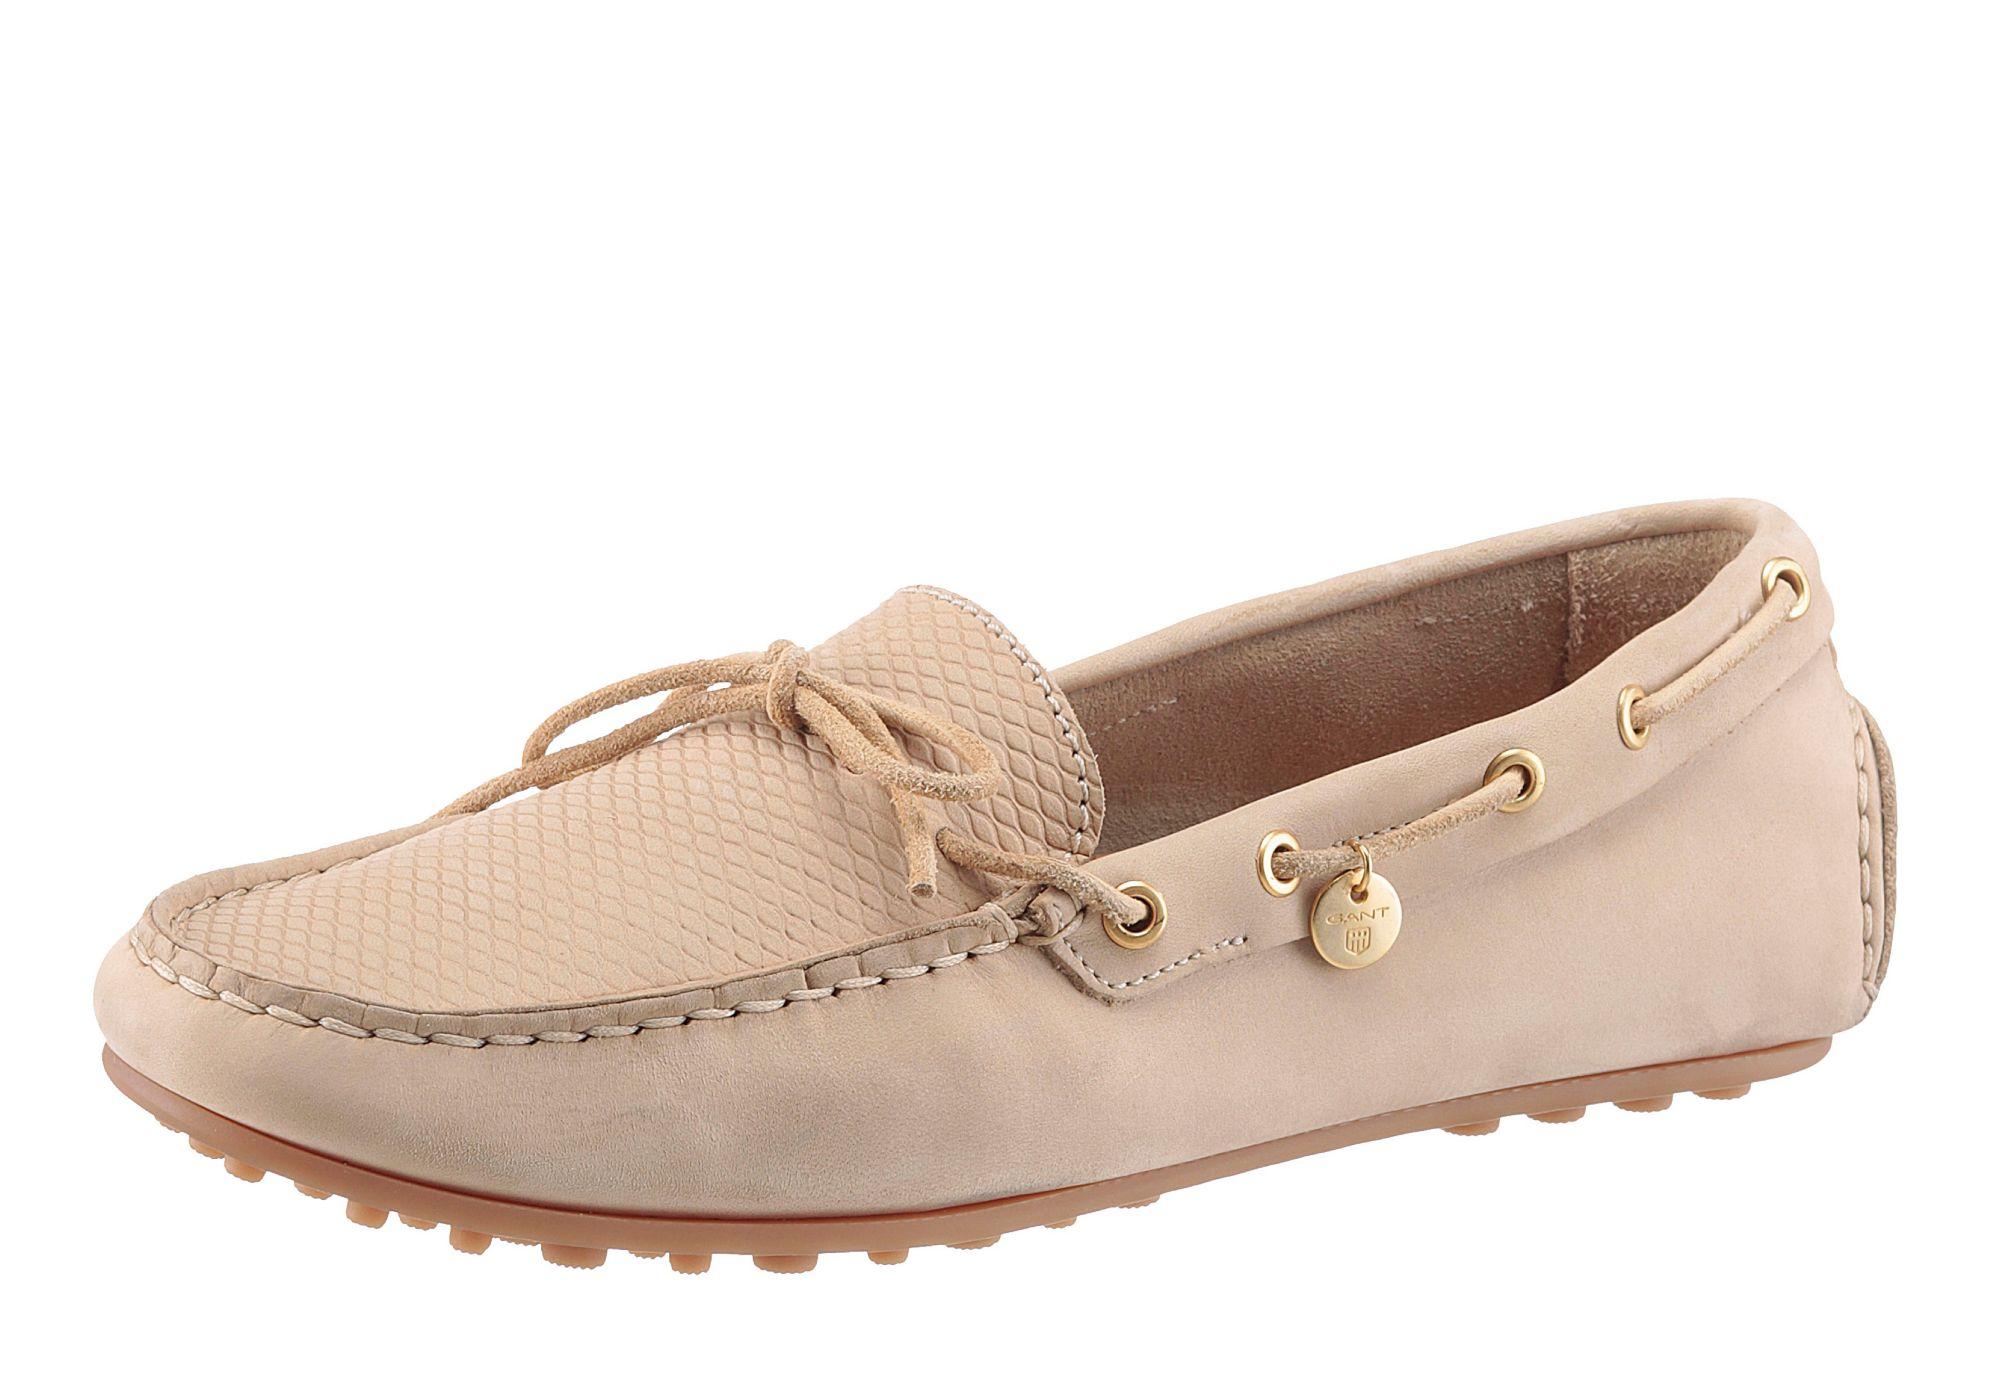 GANT FOOTWEAR Gant Footwear Mokassin